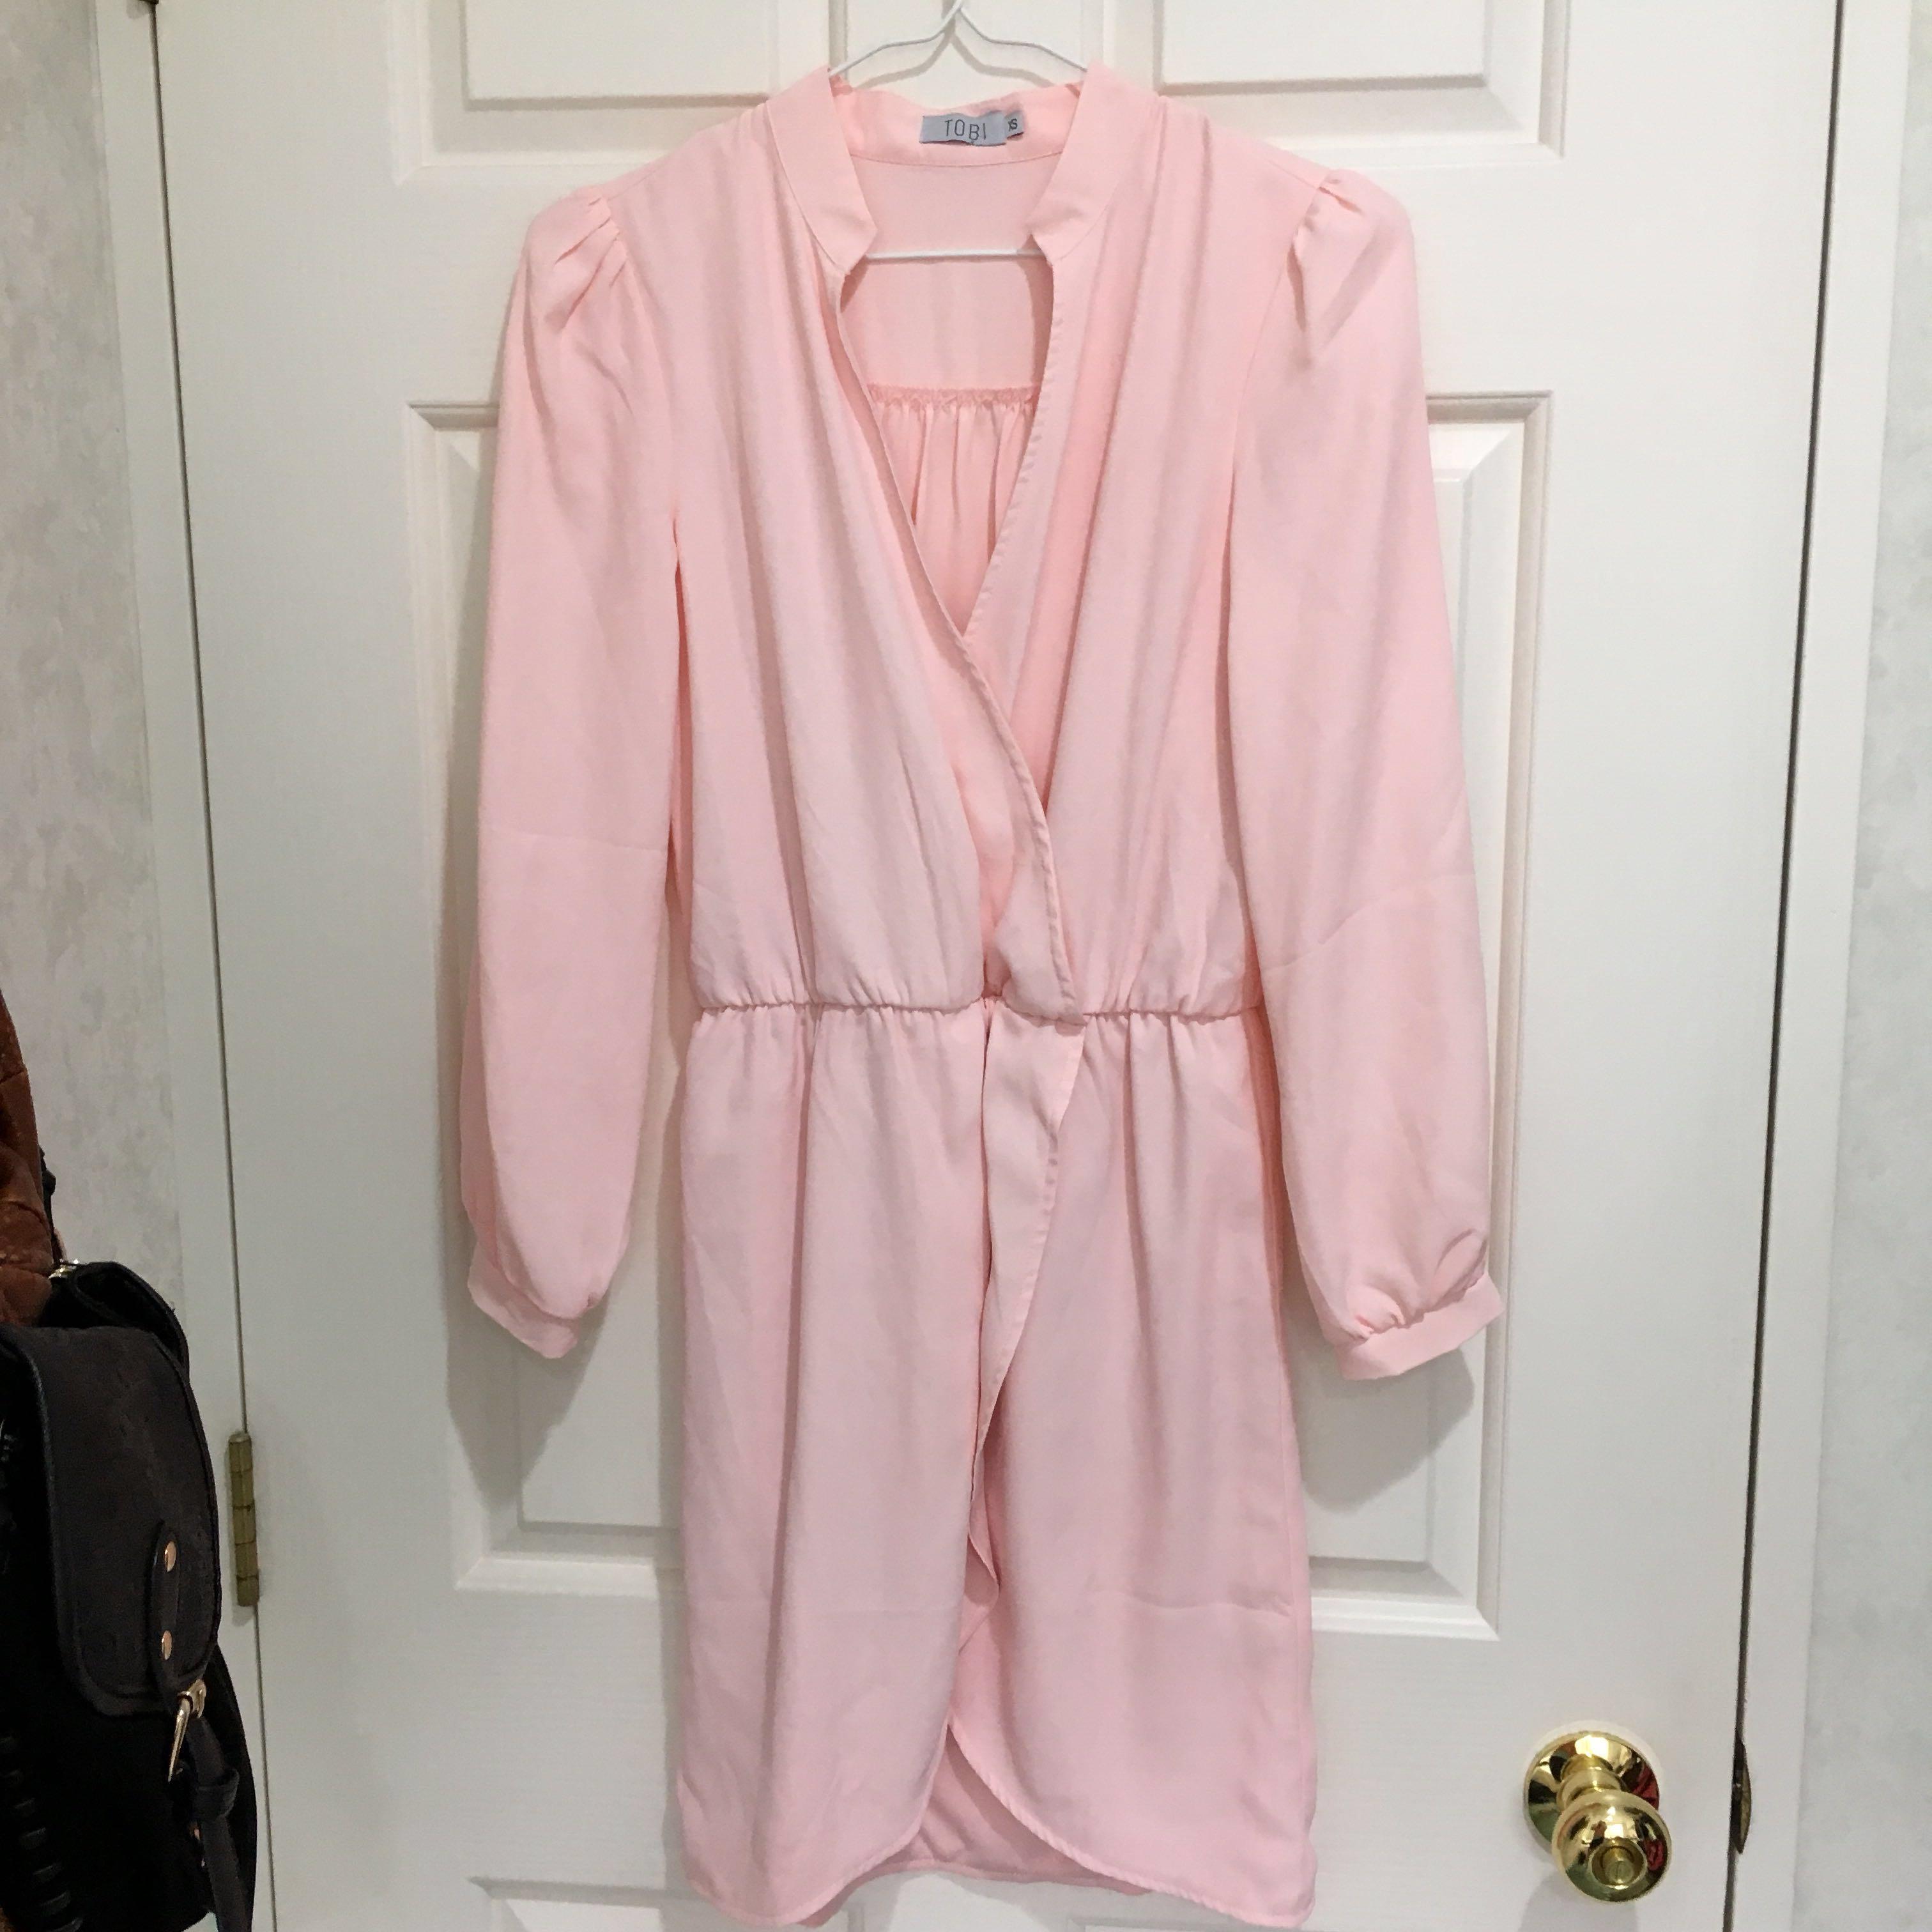 NEW Tobi dress in blush pink